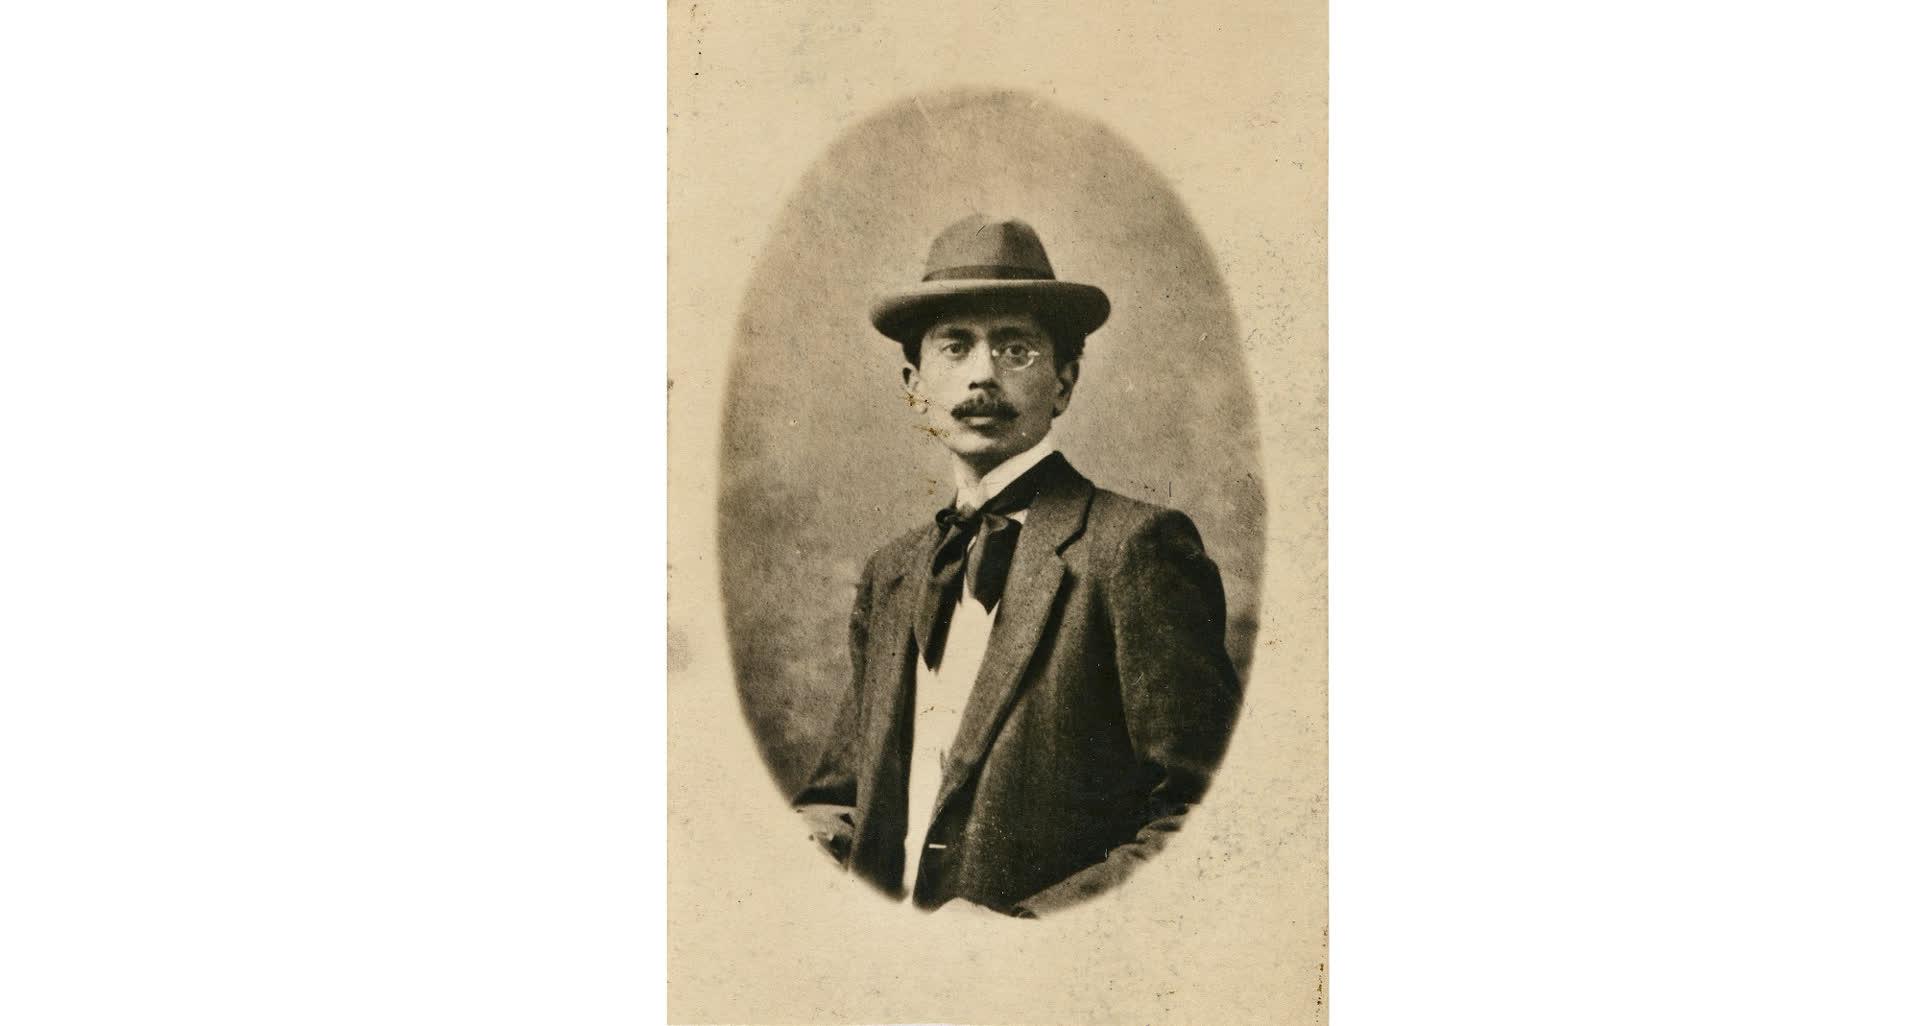 Rustom Siodia: A Forgotten Master